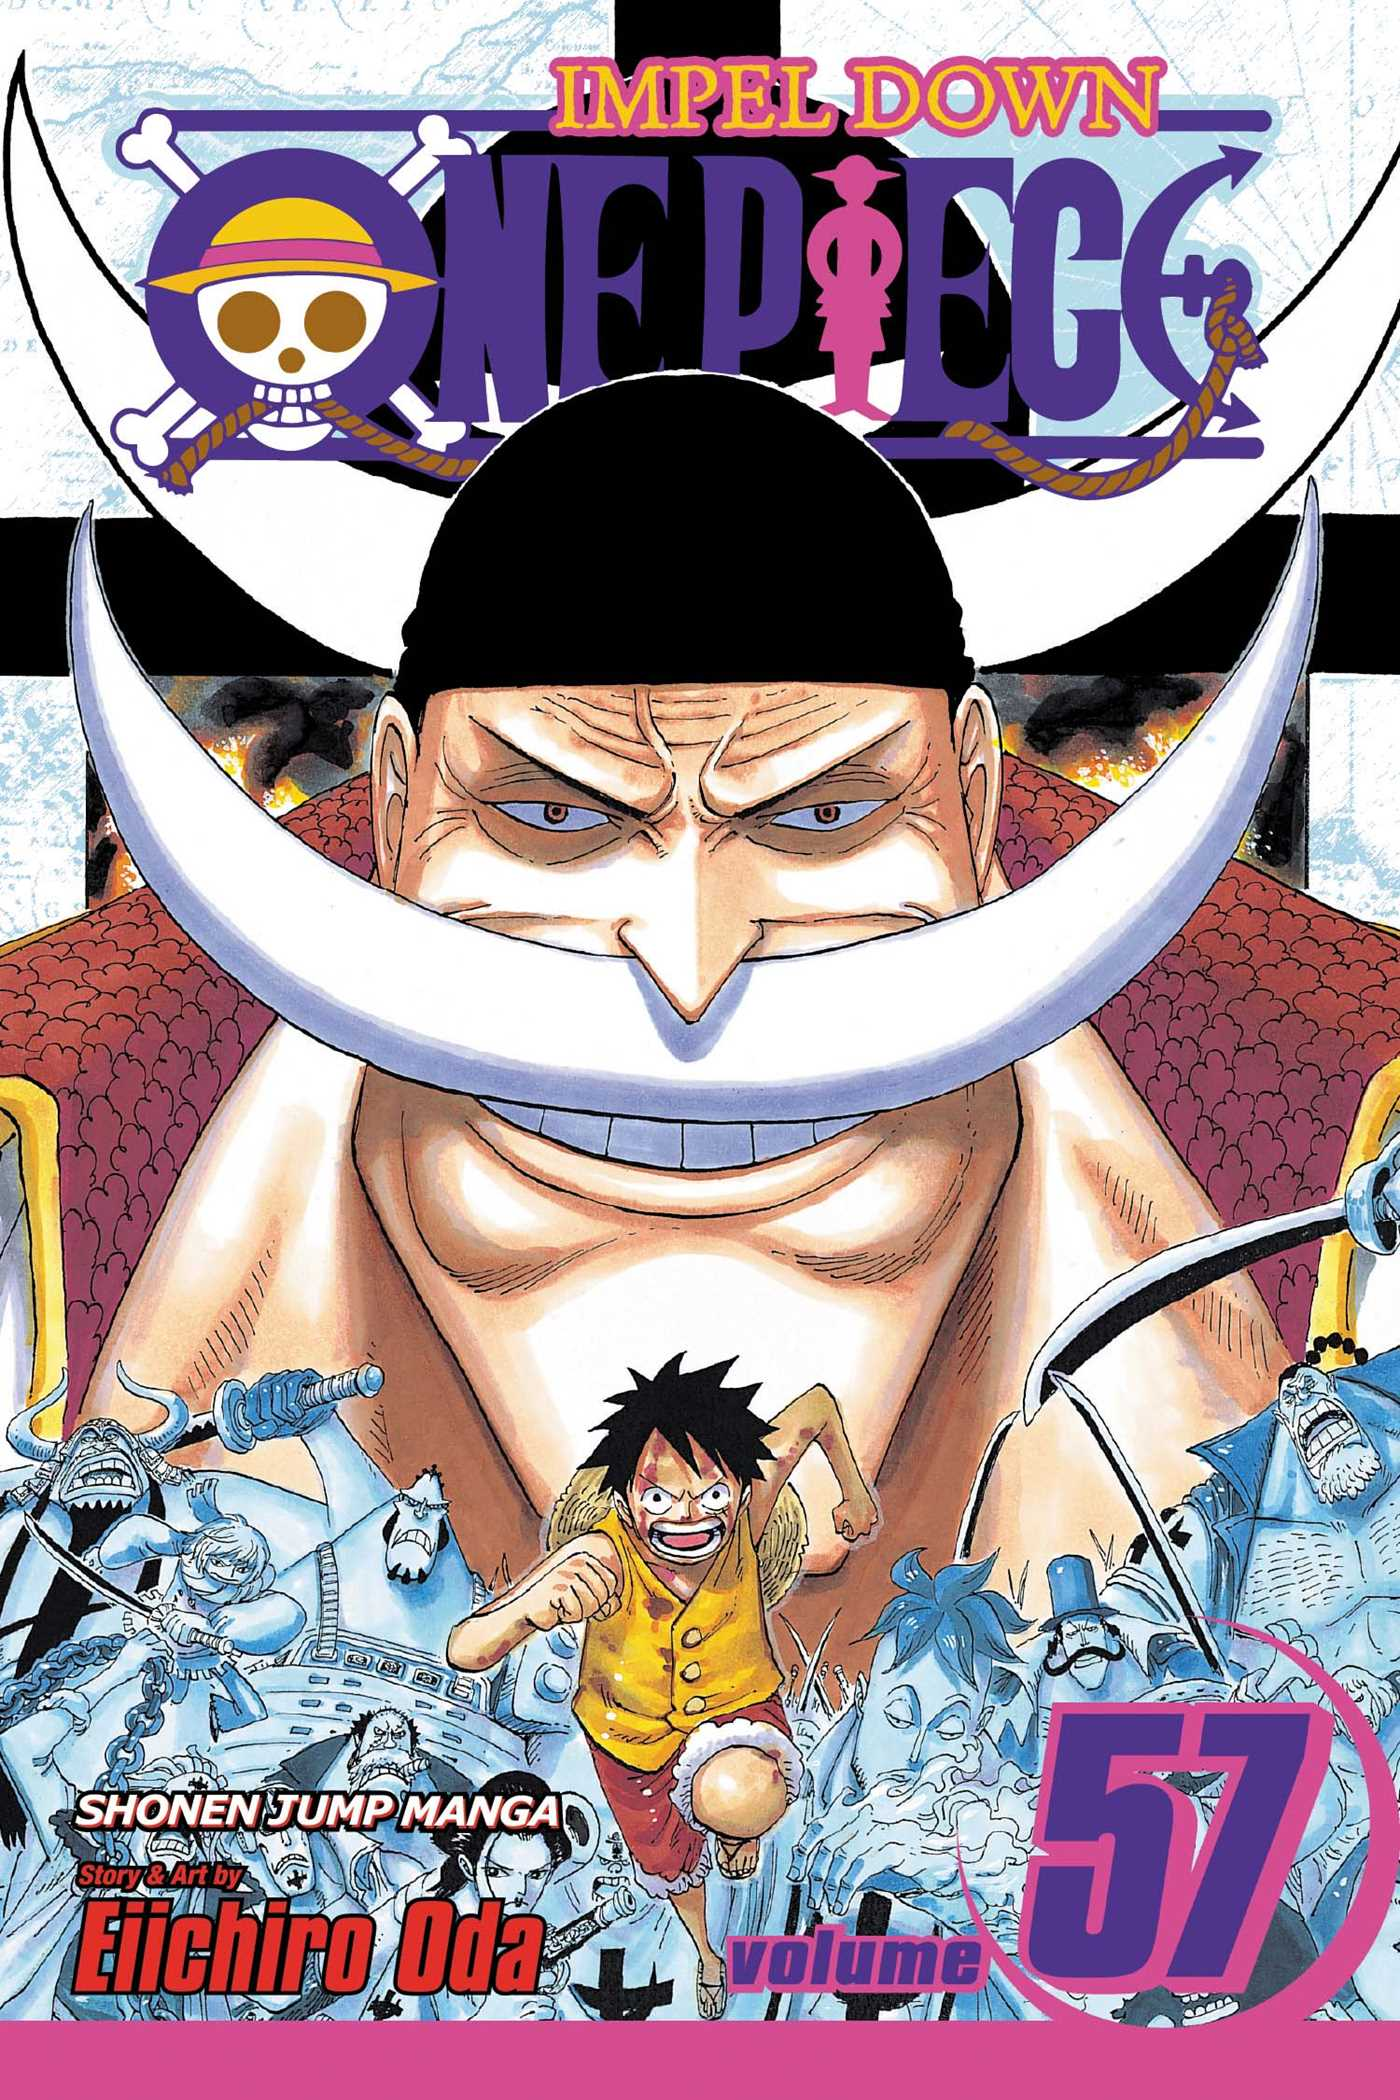 One Piece, Vol. 57   Book by Eiichiro Oda   Official ...